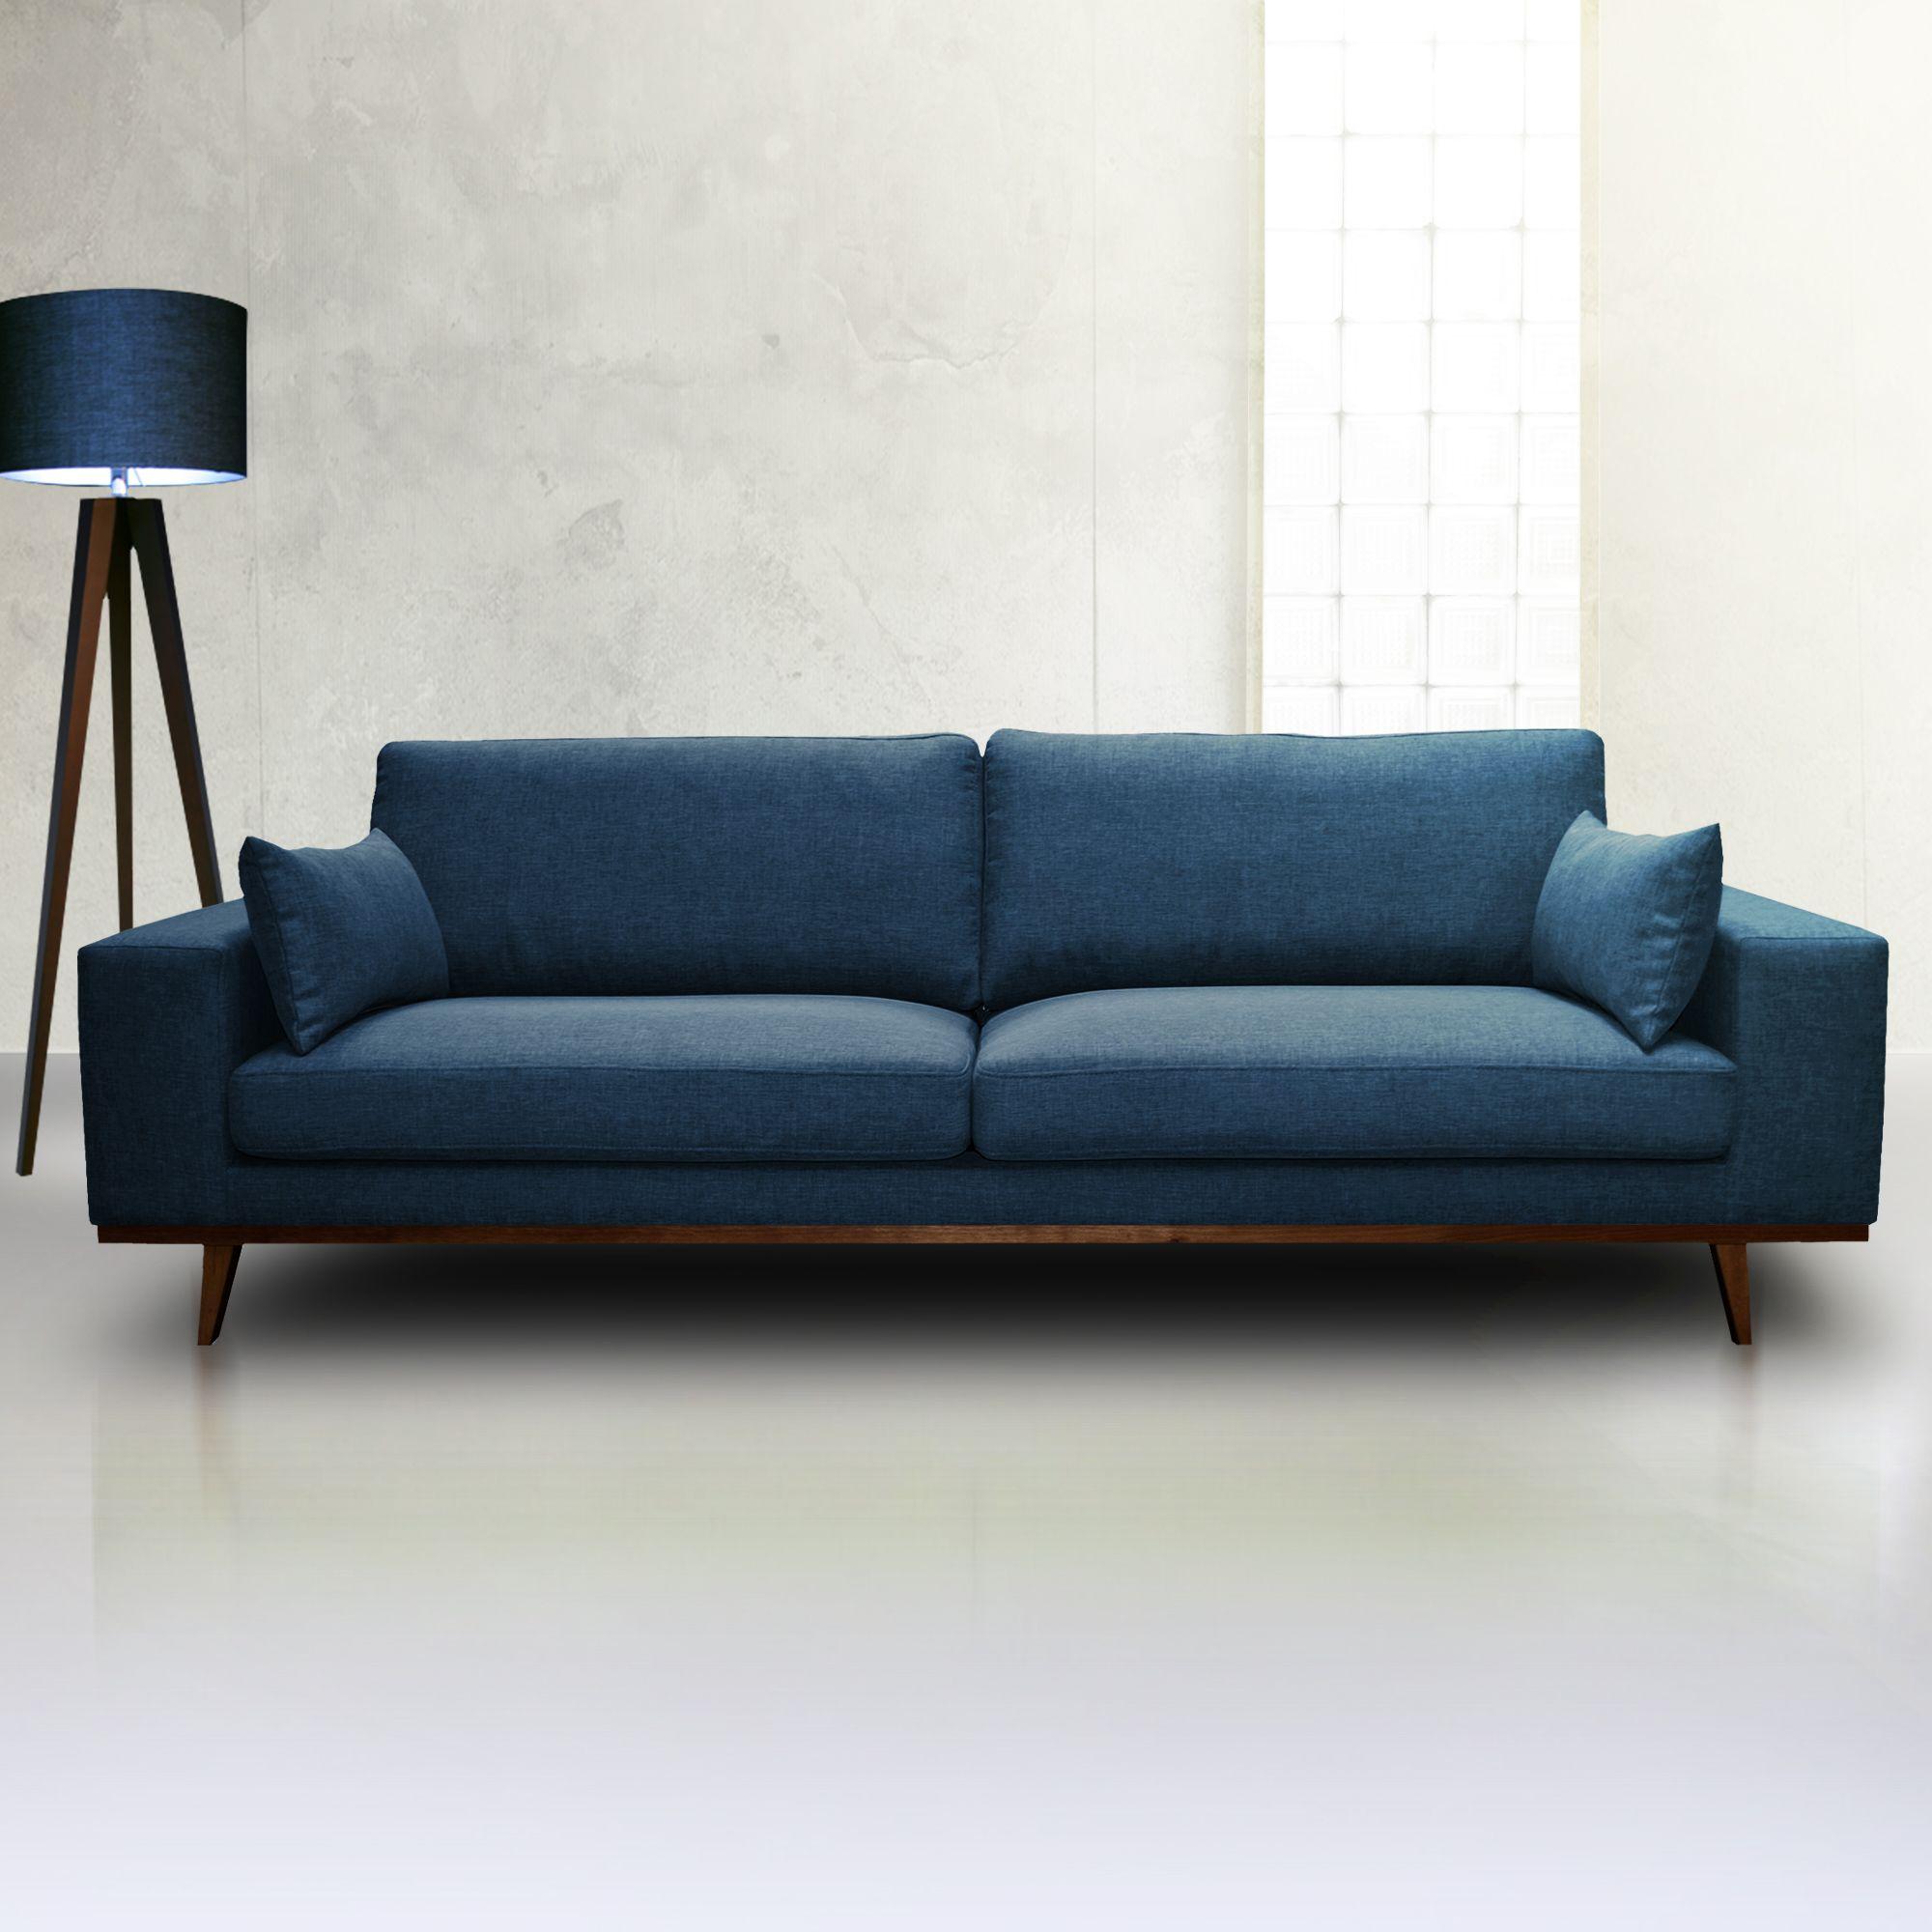 canap et fauteuil fixe et convertible 3 suisses objet to sit on in 2018 pinterest. Black Bedroom Furniture Sets. Home Design Ideas